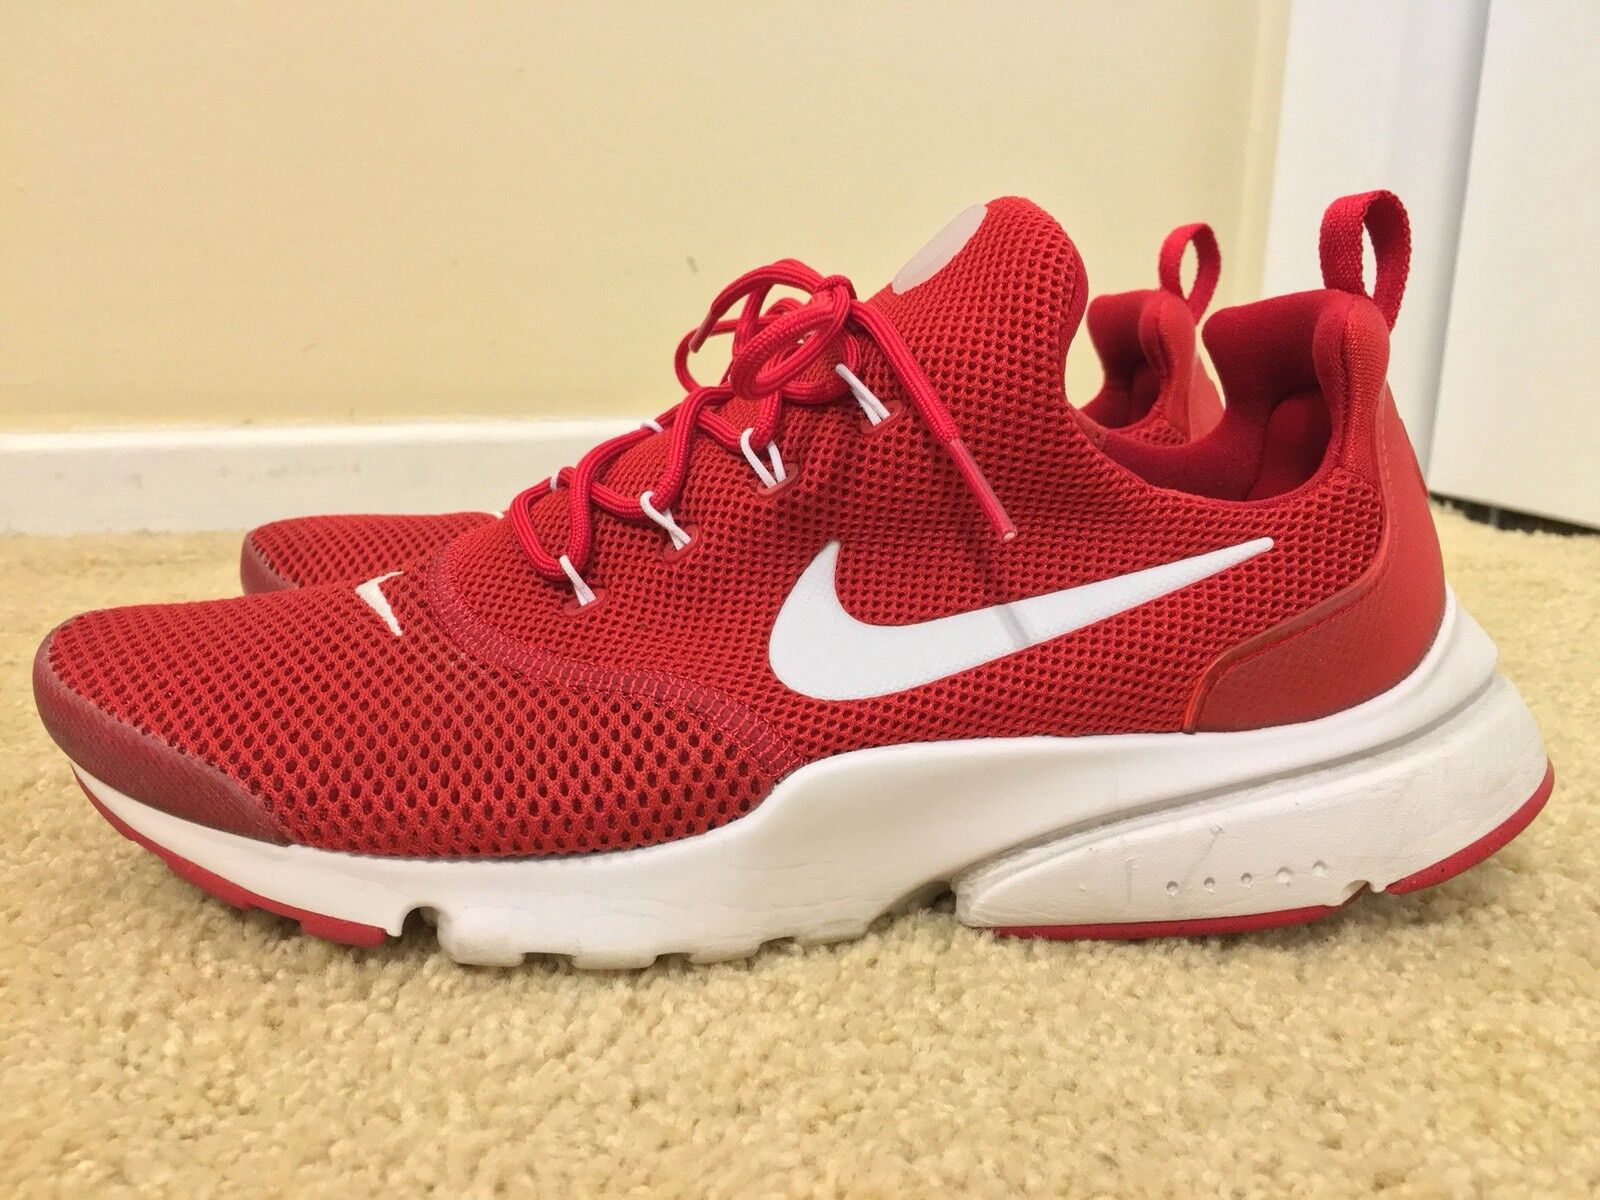 a3e06e004a Nike Air Presto Fly, 908019-600, Gym Red White, Men's Running shoes ...